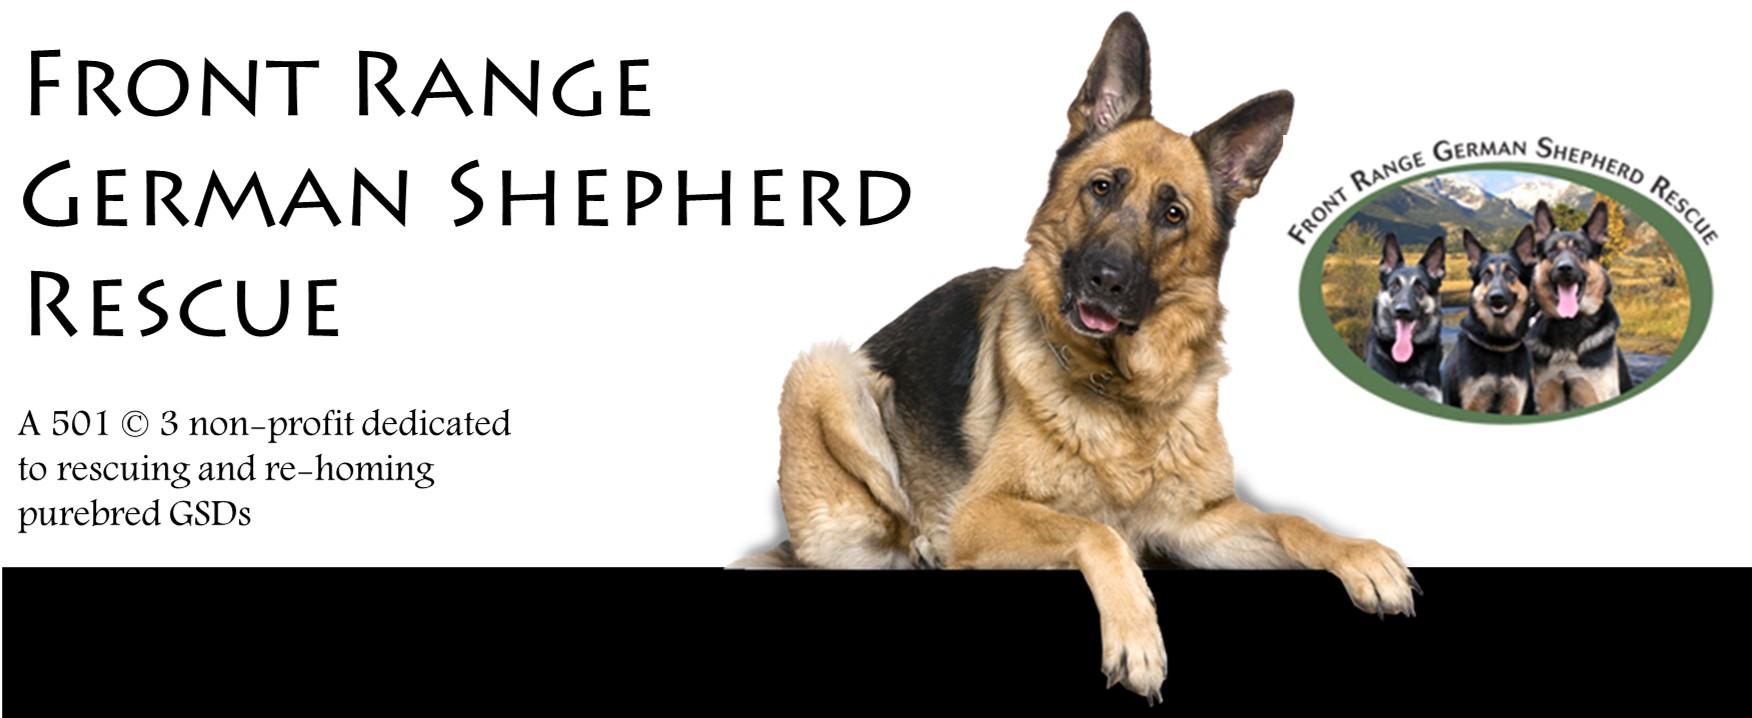 Front Range German Shepherd Rescue